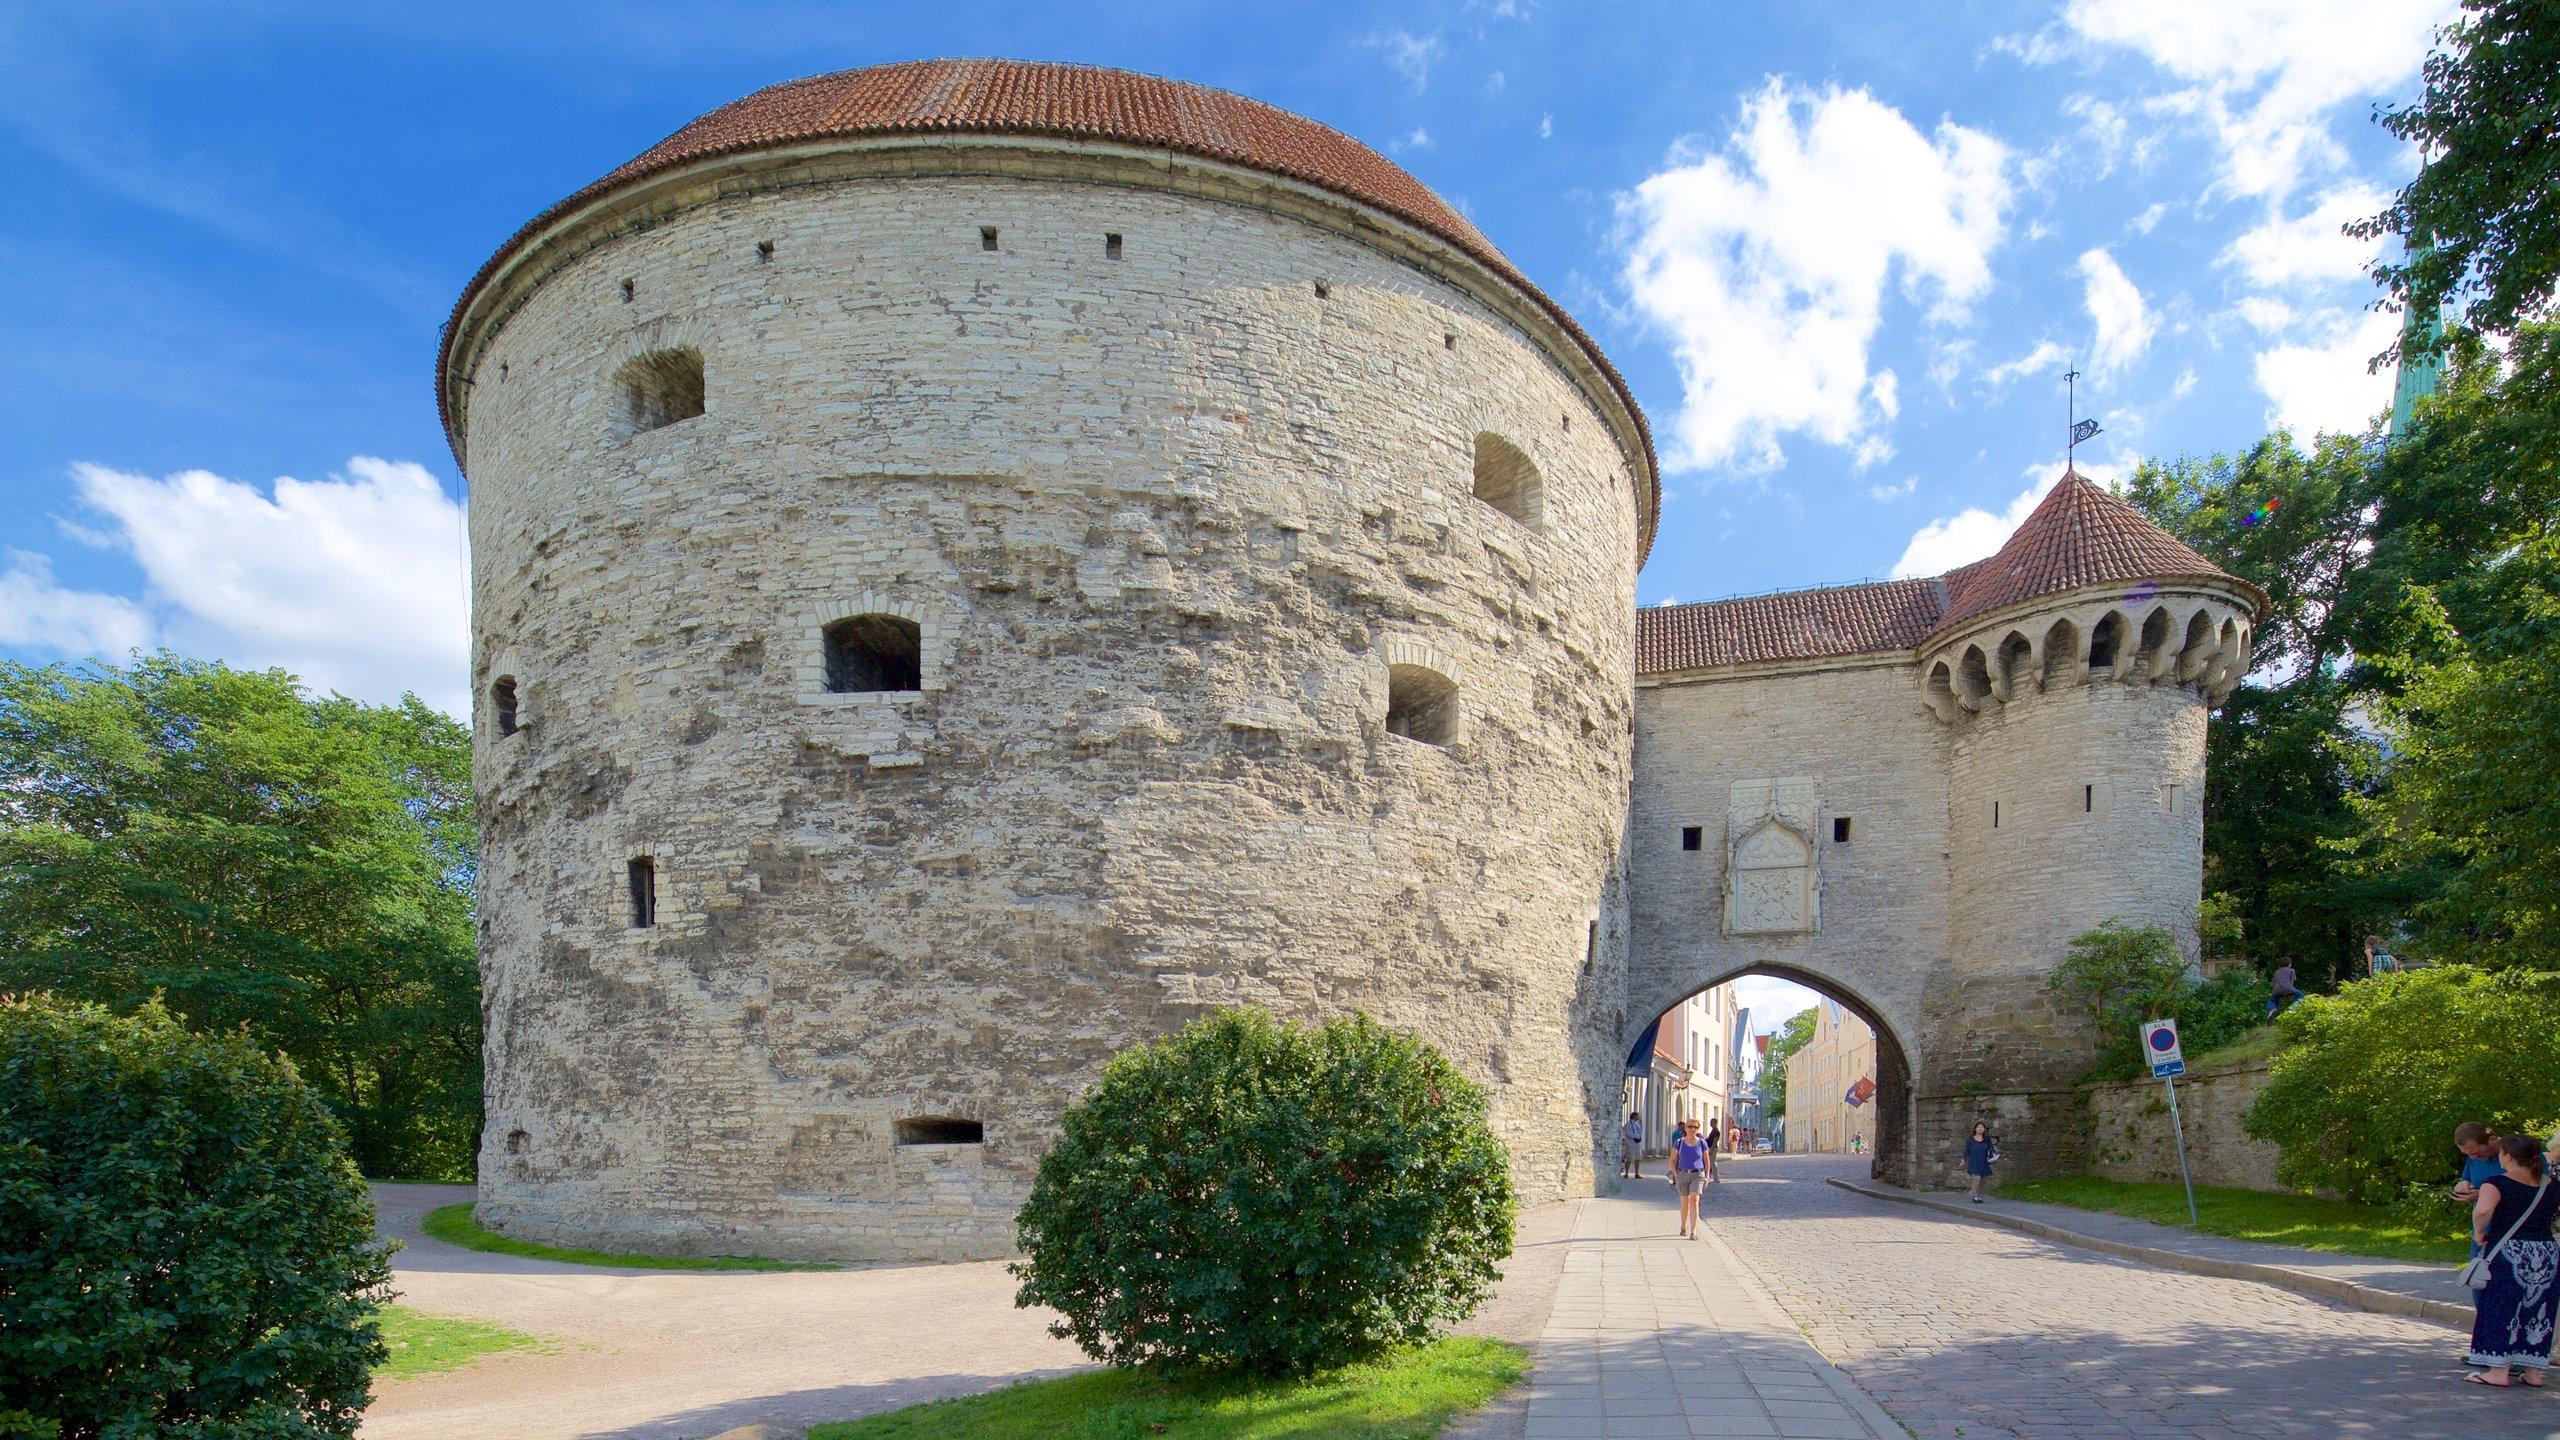 Great Coastal Gate, Tallinn, Harju County, Estonia